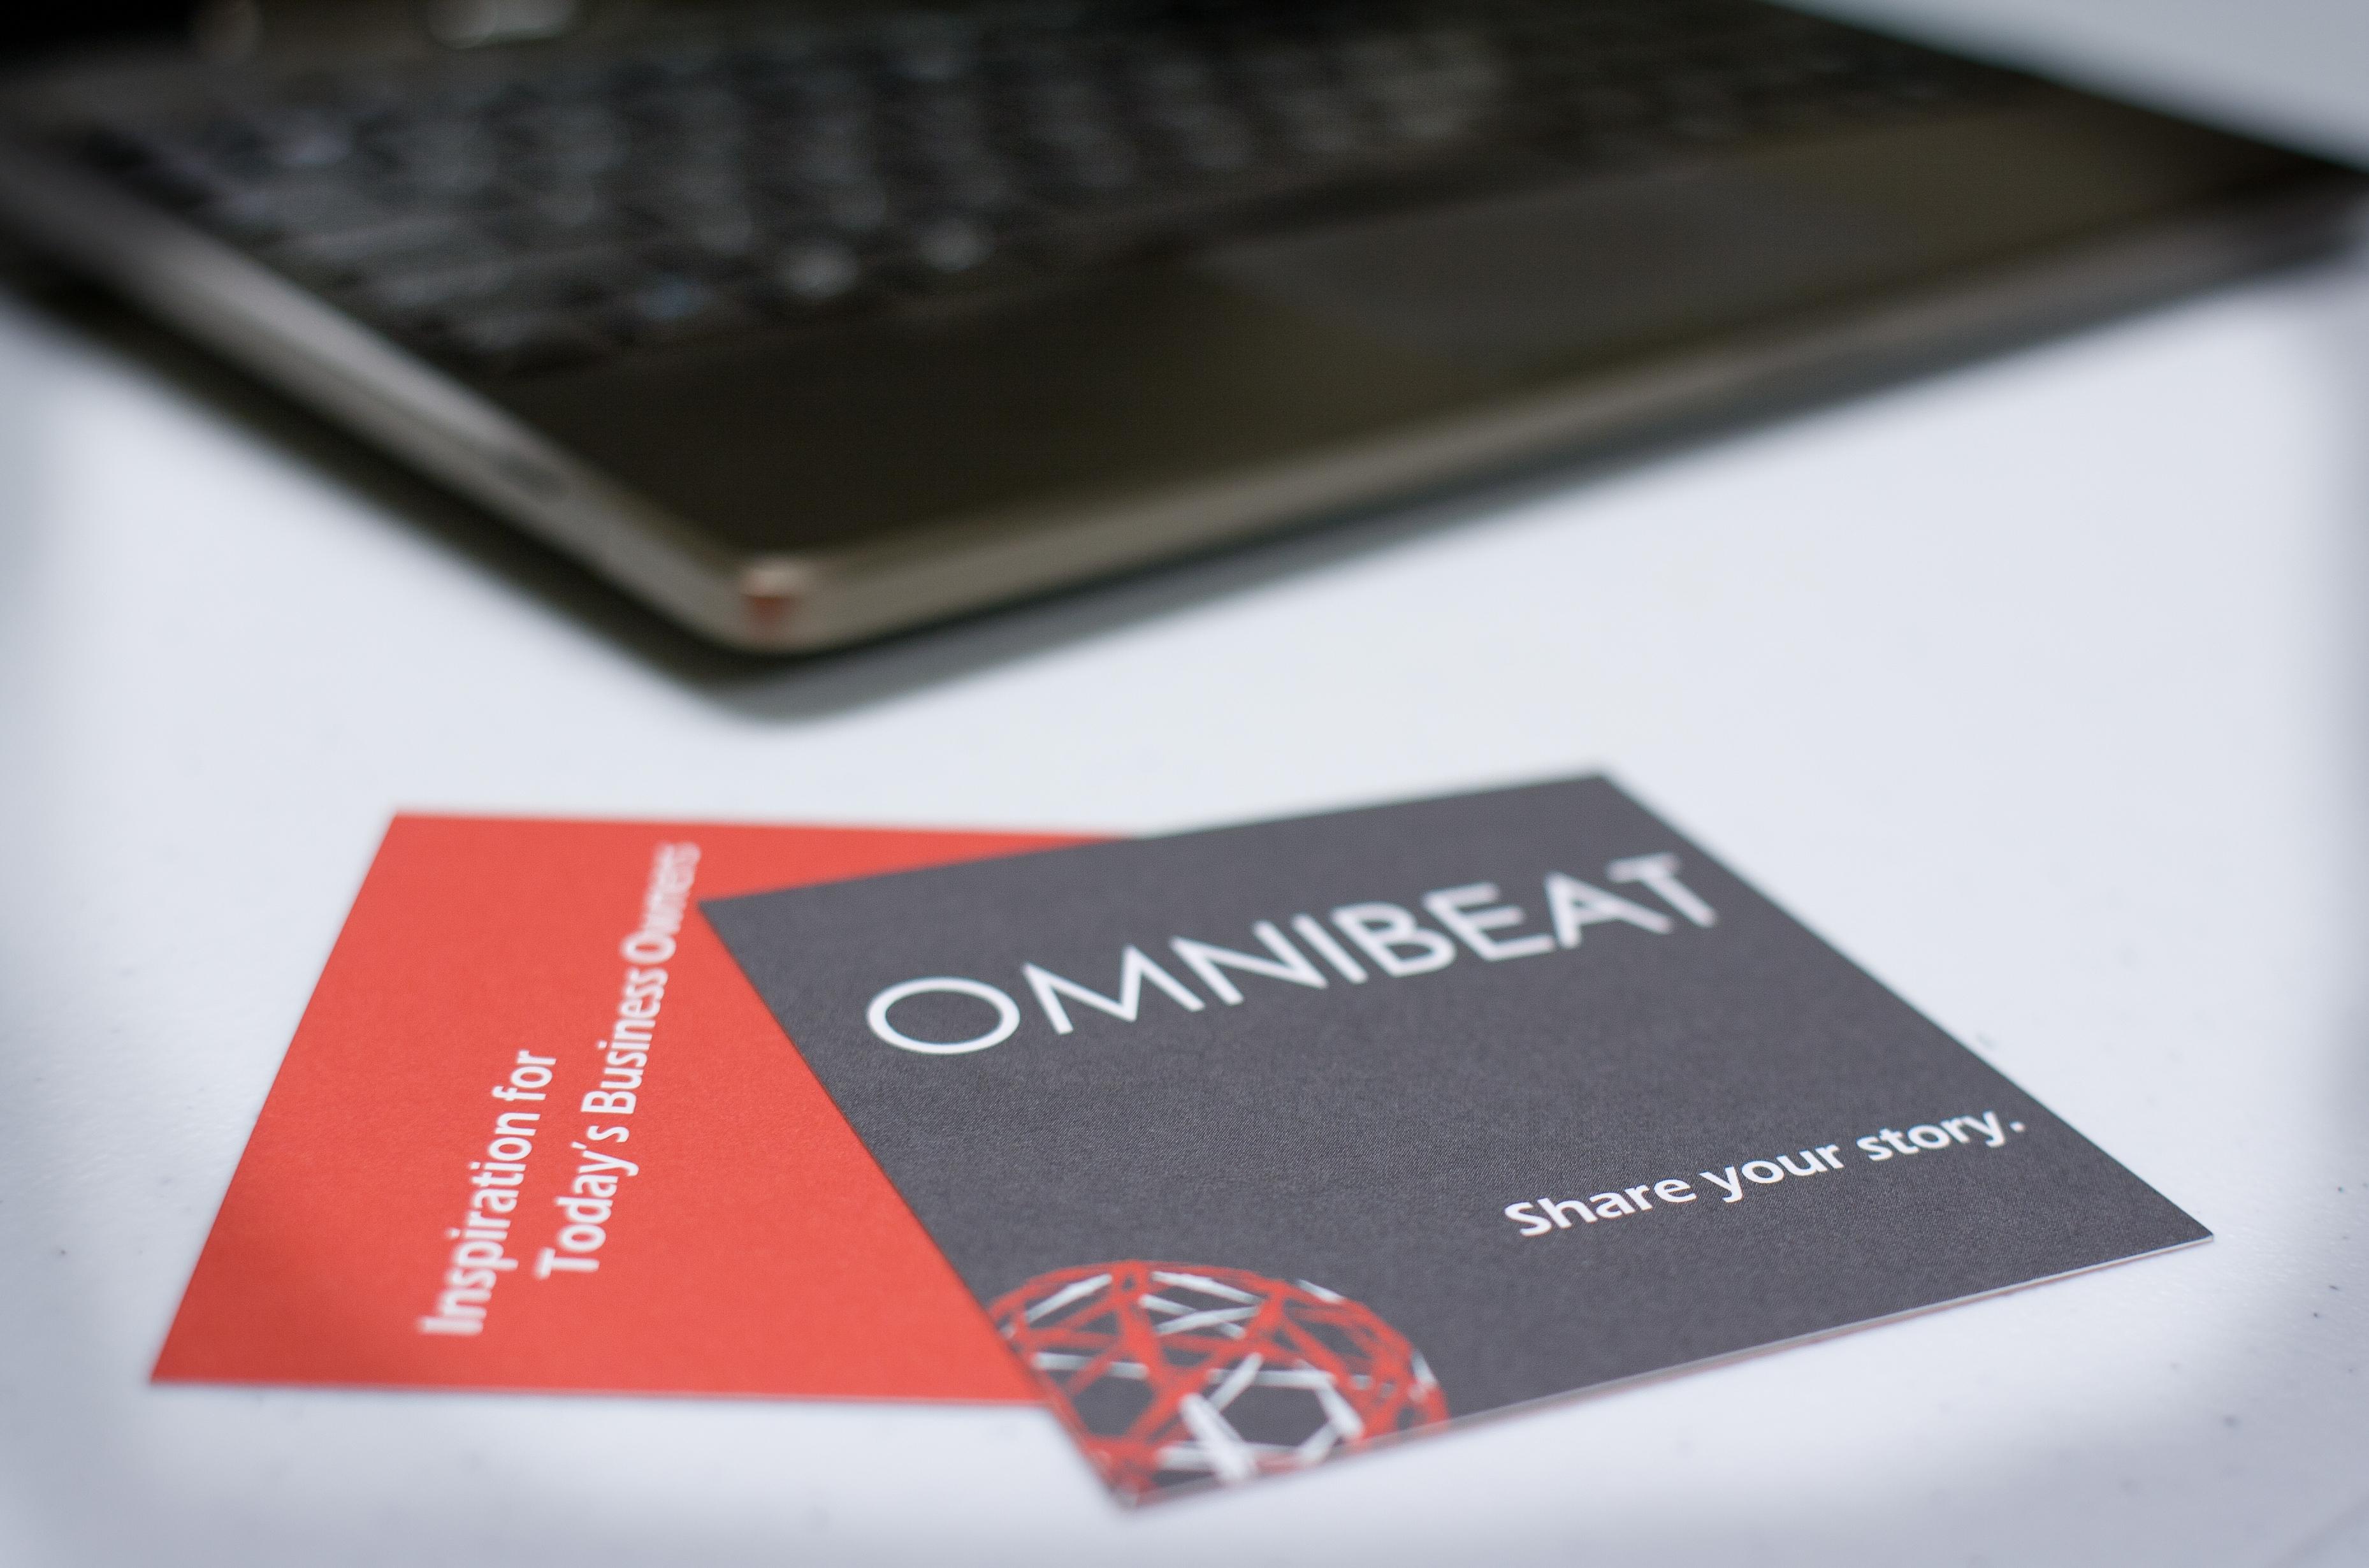 Omnibeat image 4